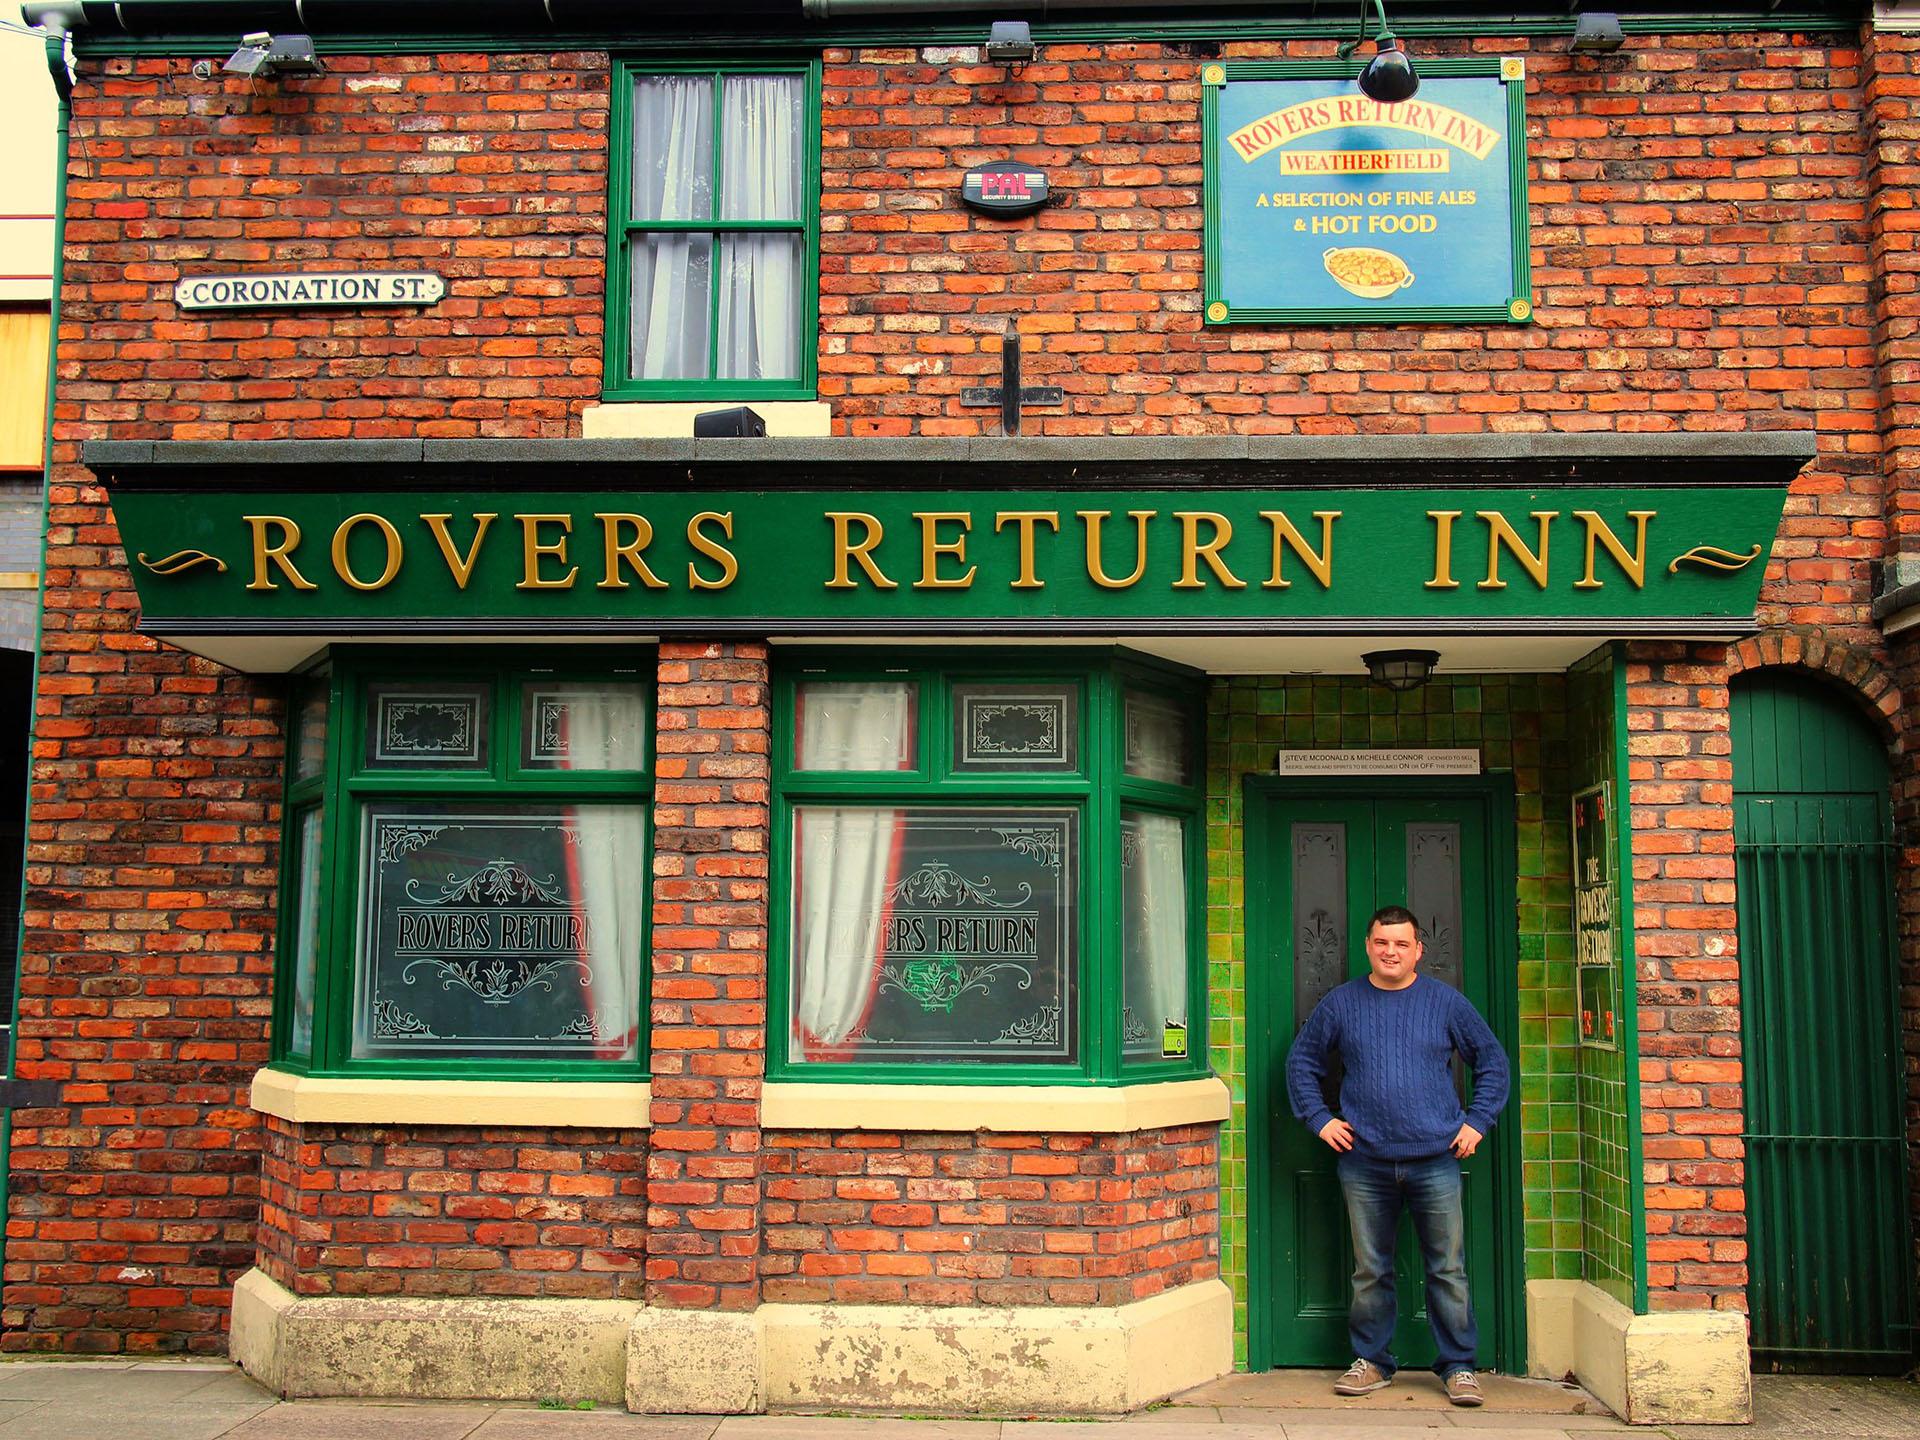 The Rovers Return Inn Coronation Street